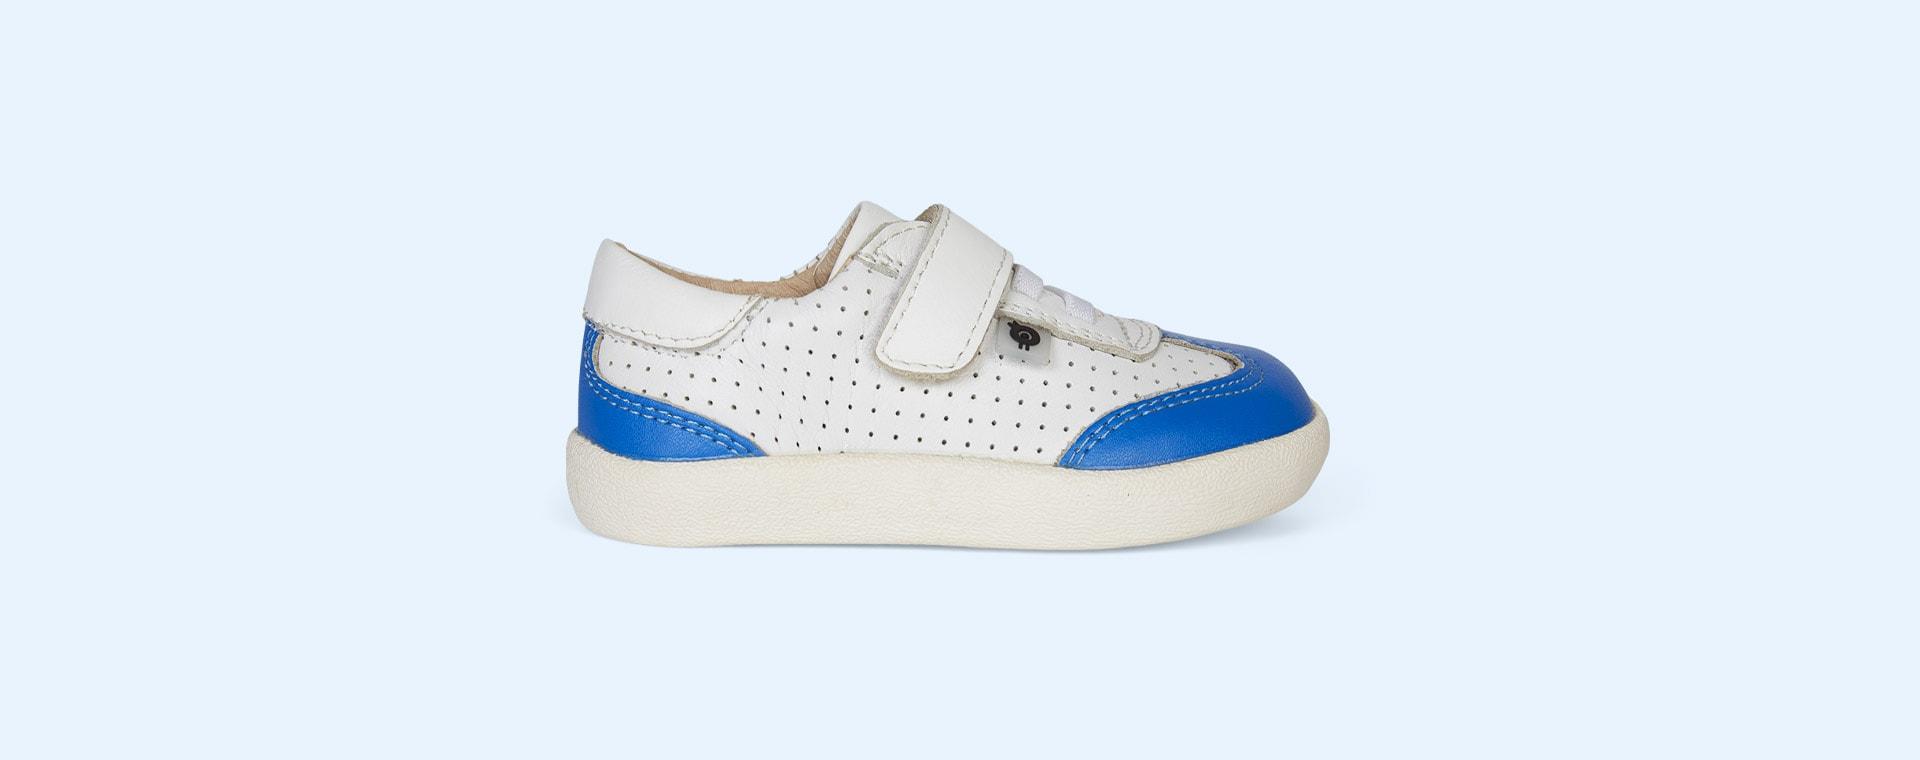 Blue old soles Paver Trainer